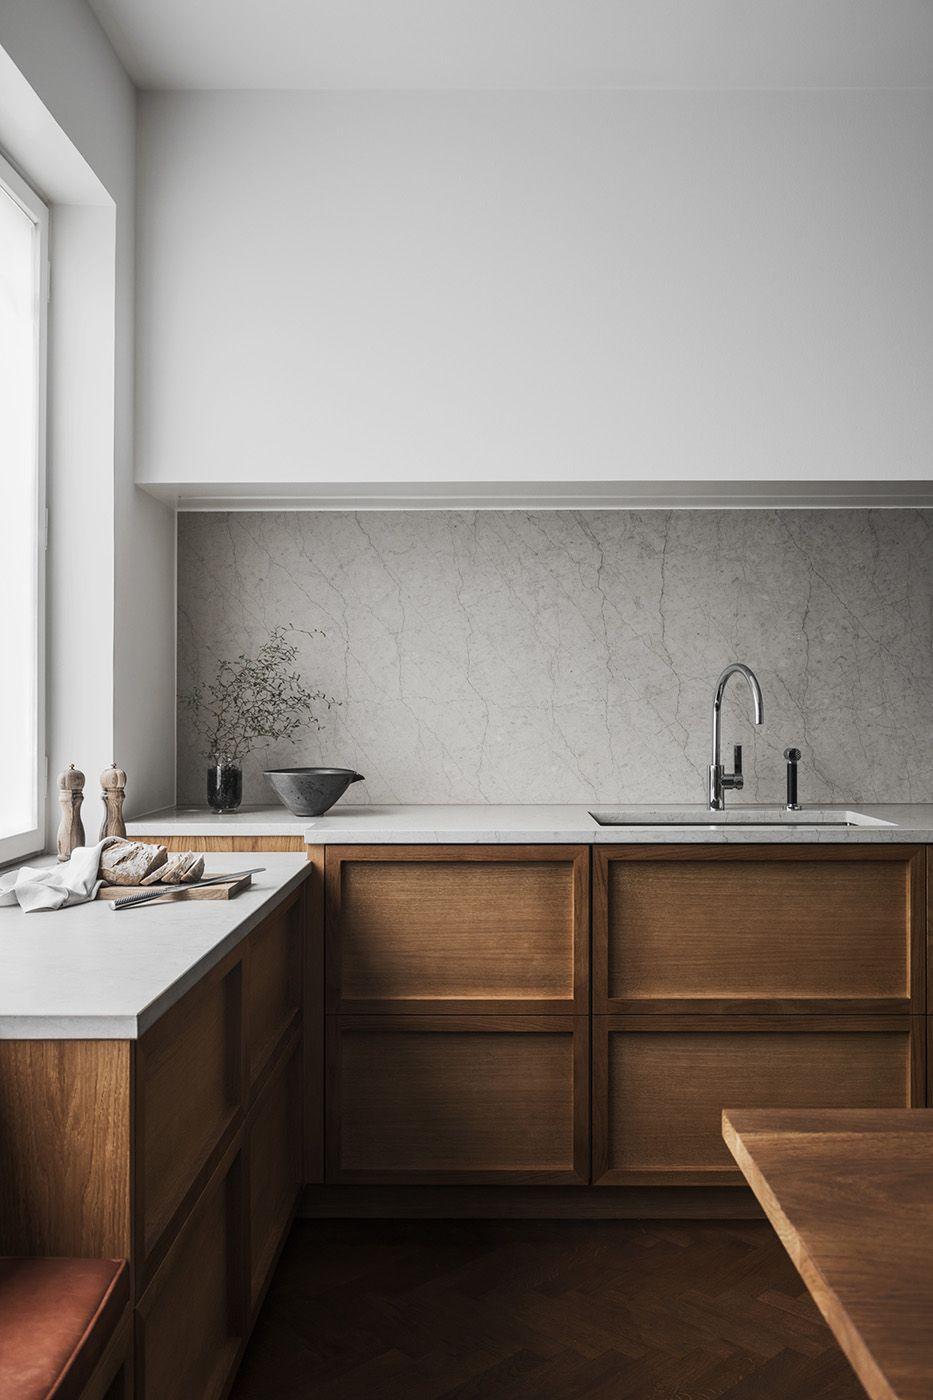 liljencrantz design — ©all rights reserved 2017 interior and